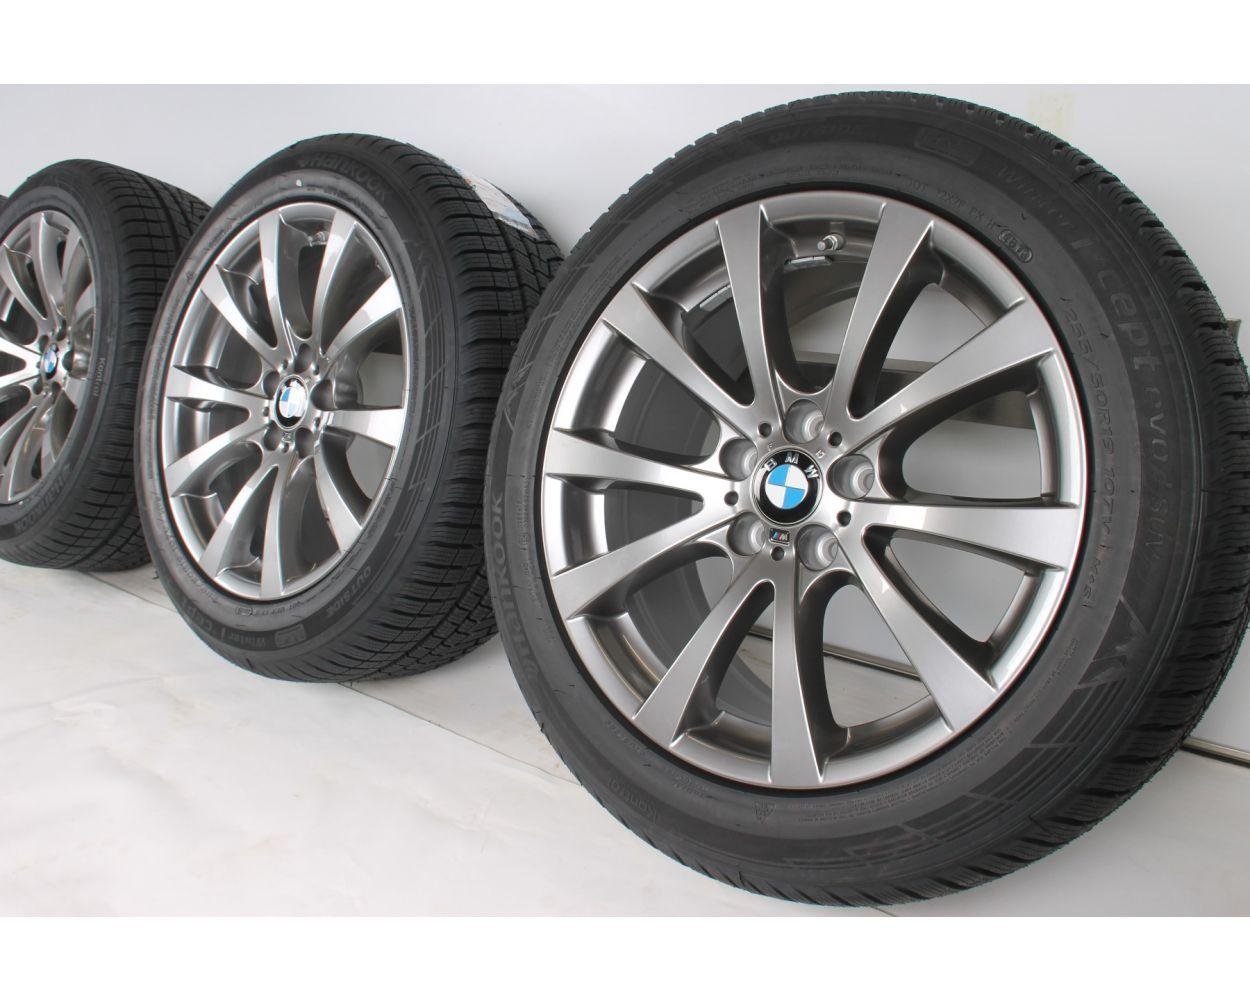 Bmw Winter Wheels X5m E70 X6m E71 19 Zoll M V Spoke 298 Silber